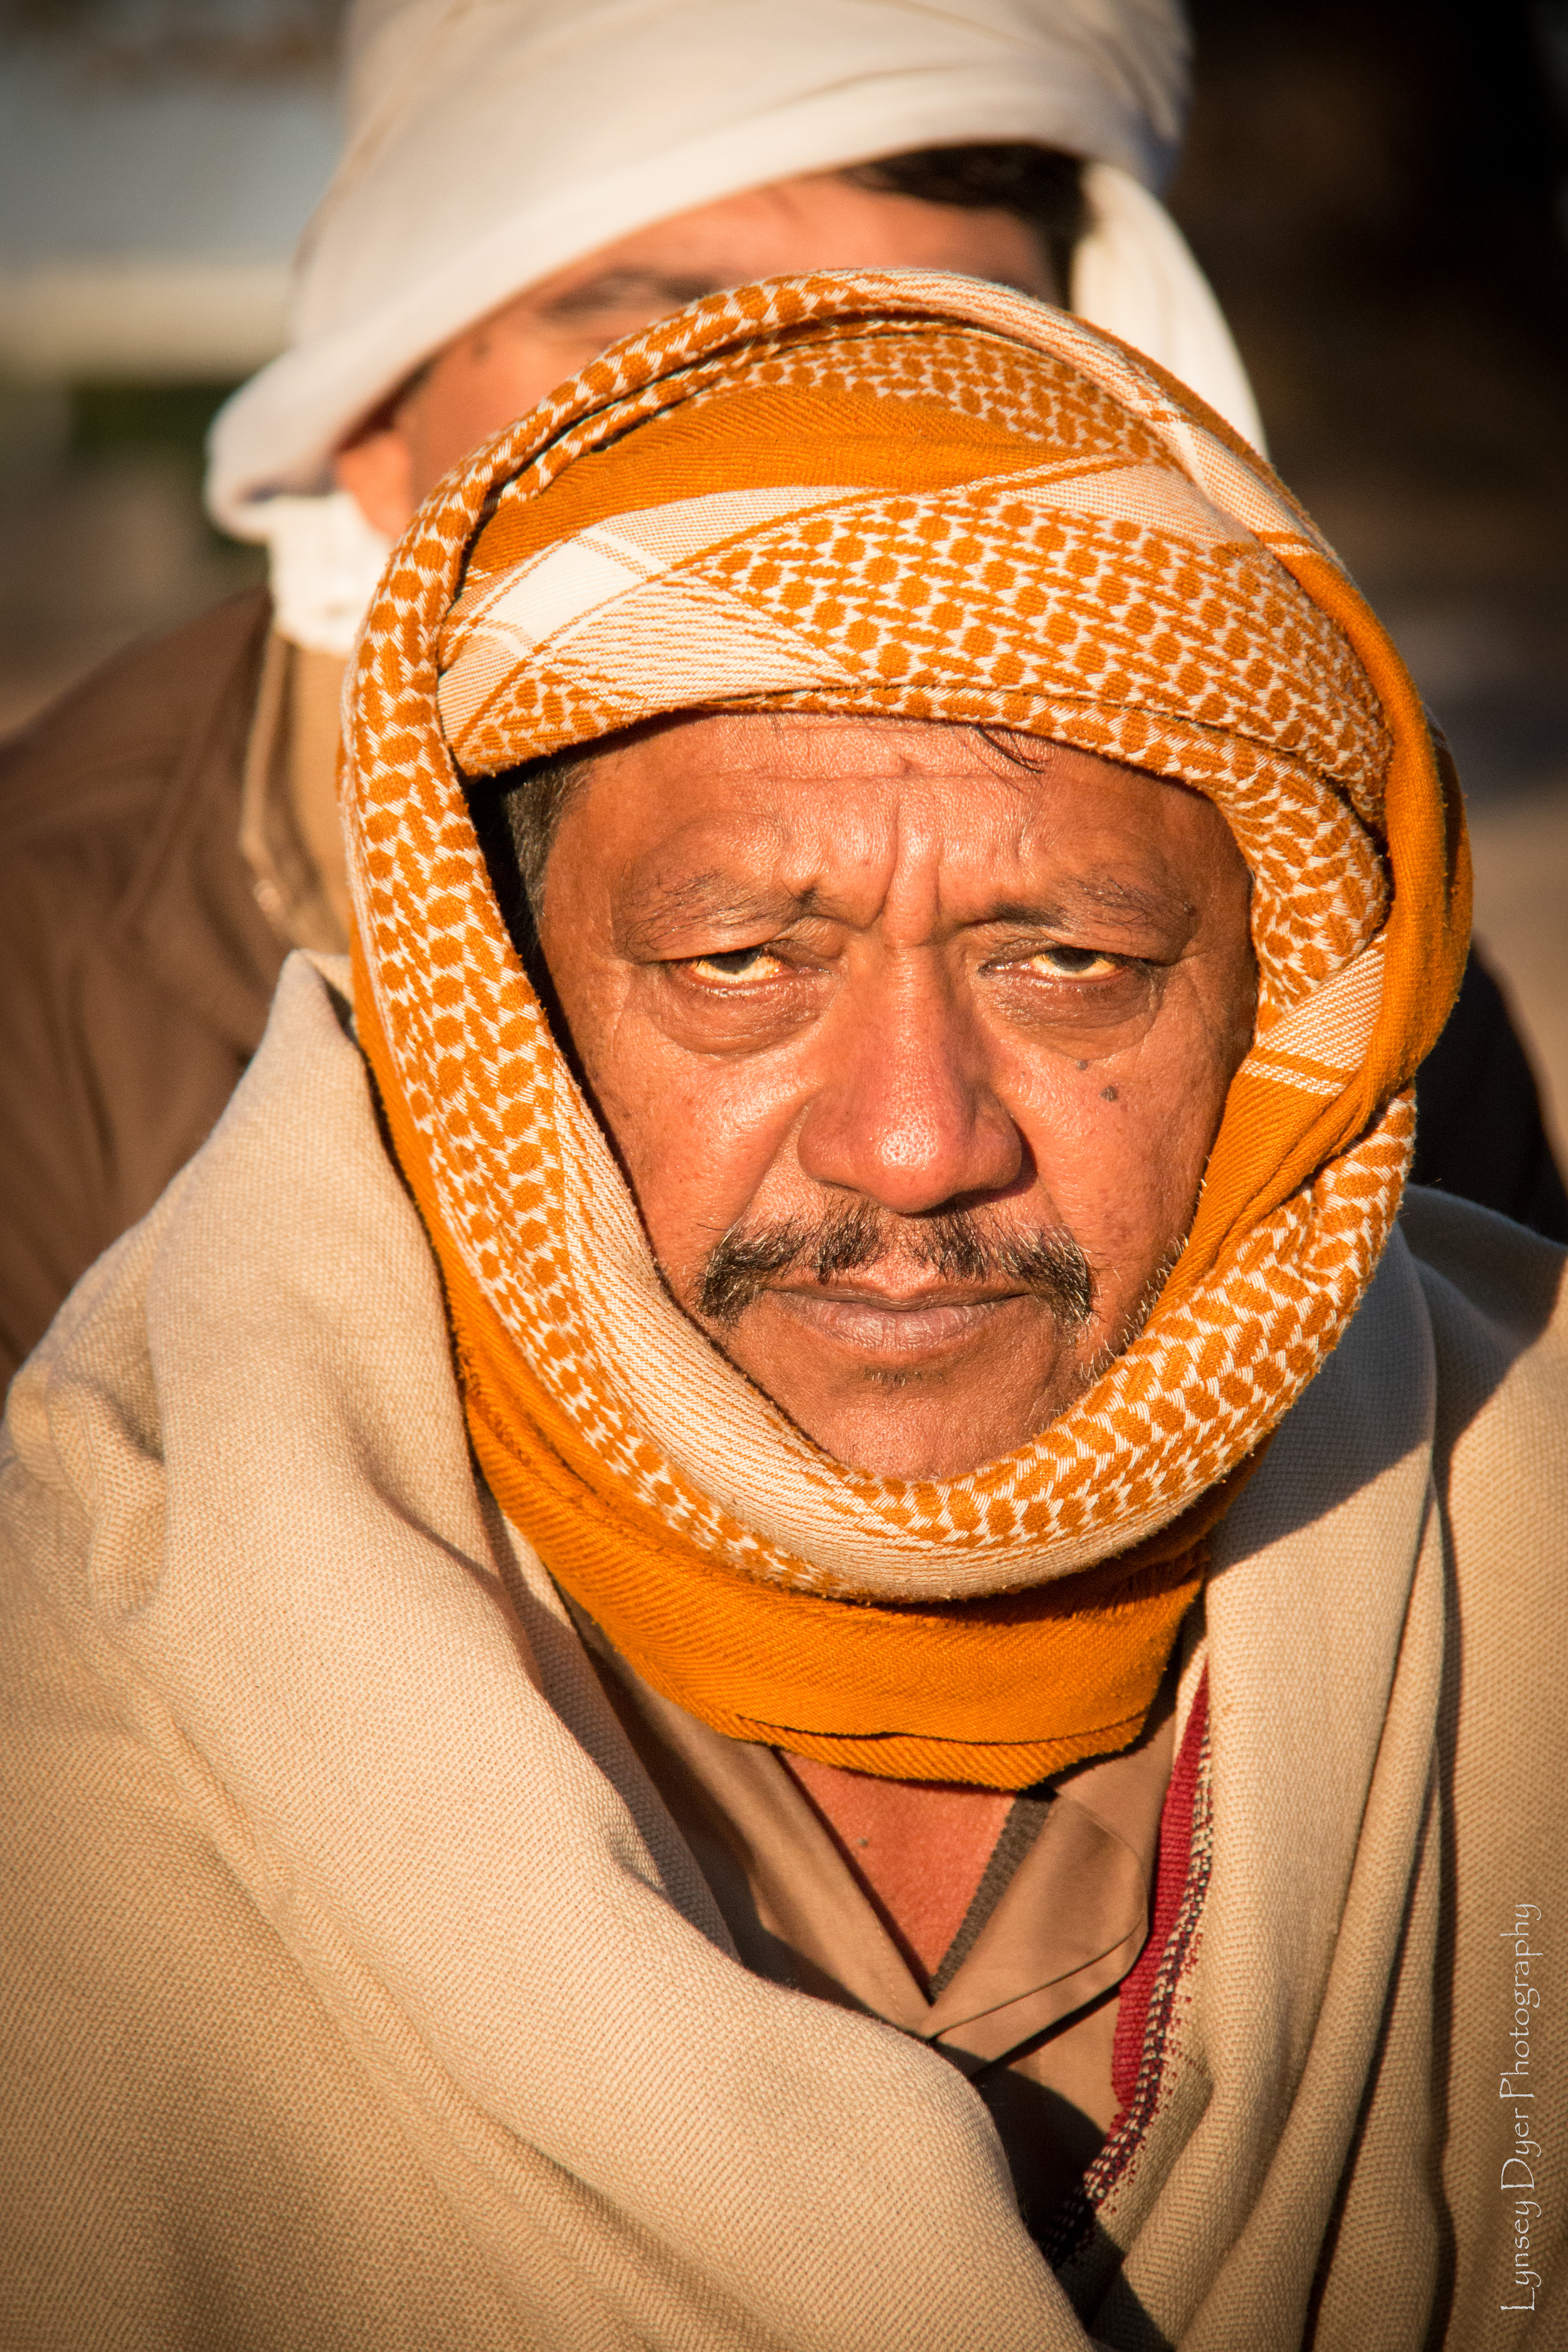 11. Dubai Fish Market Characters